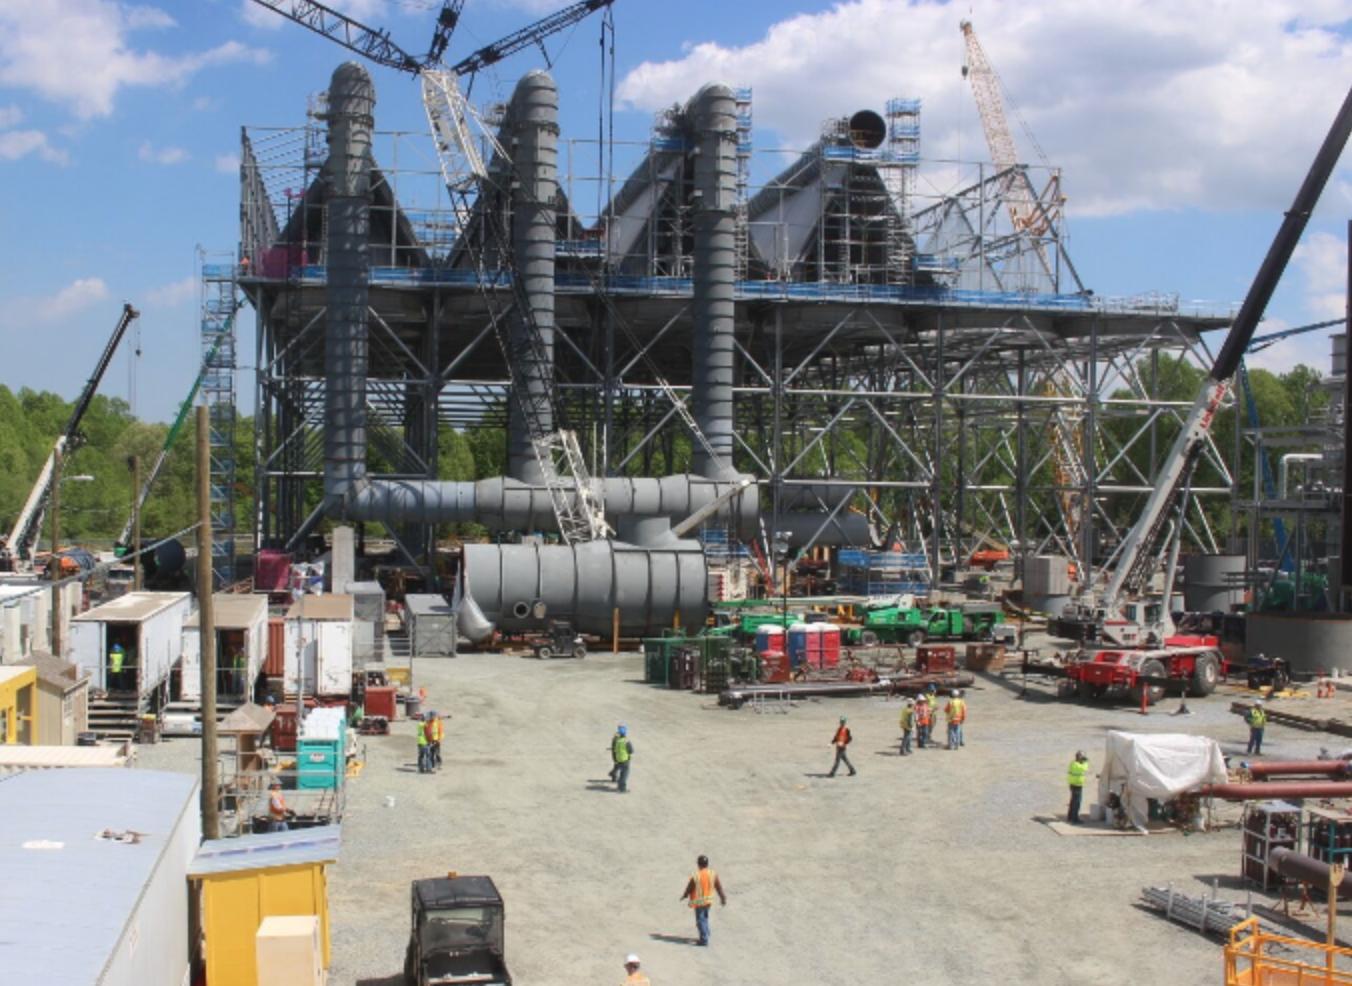 PSEG KEYS ENERGY CENTER: CONSTRUCTION STATUS UPDATE (as of May 1, 2017)